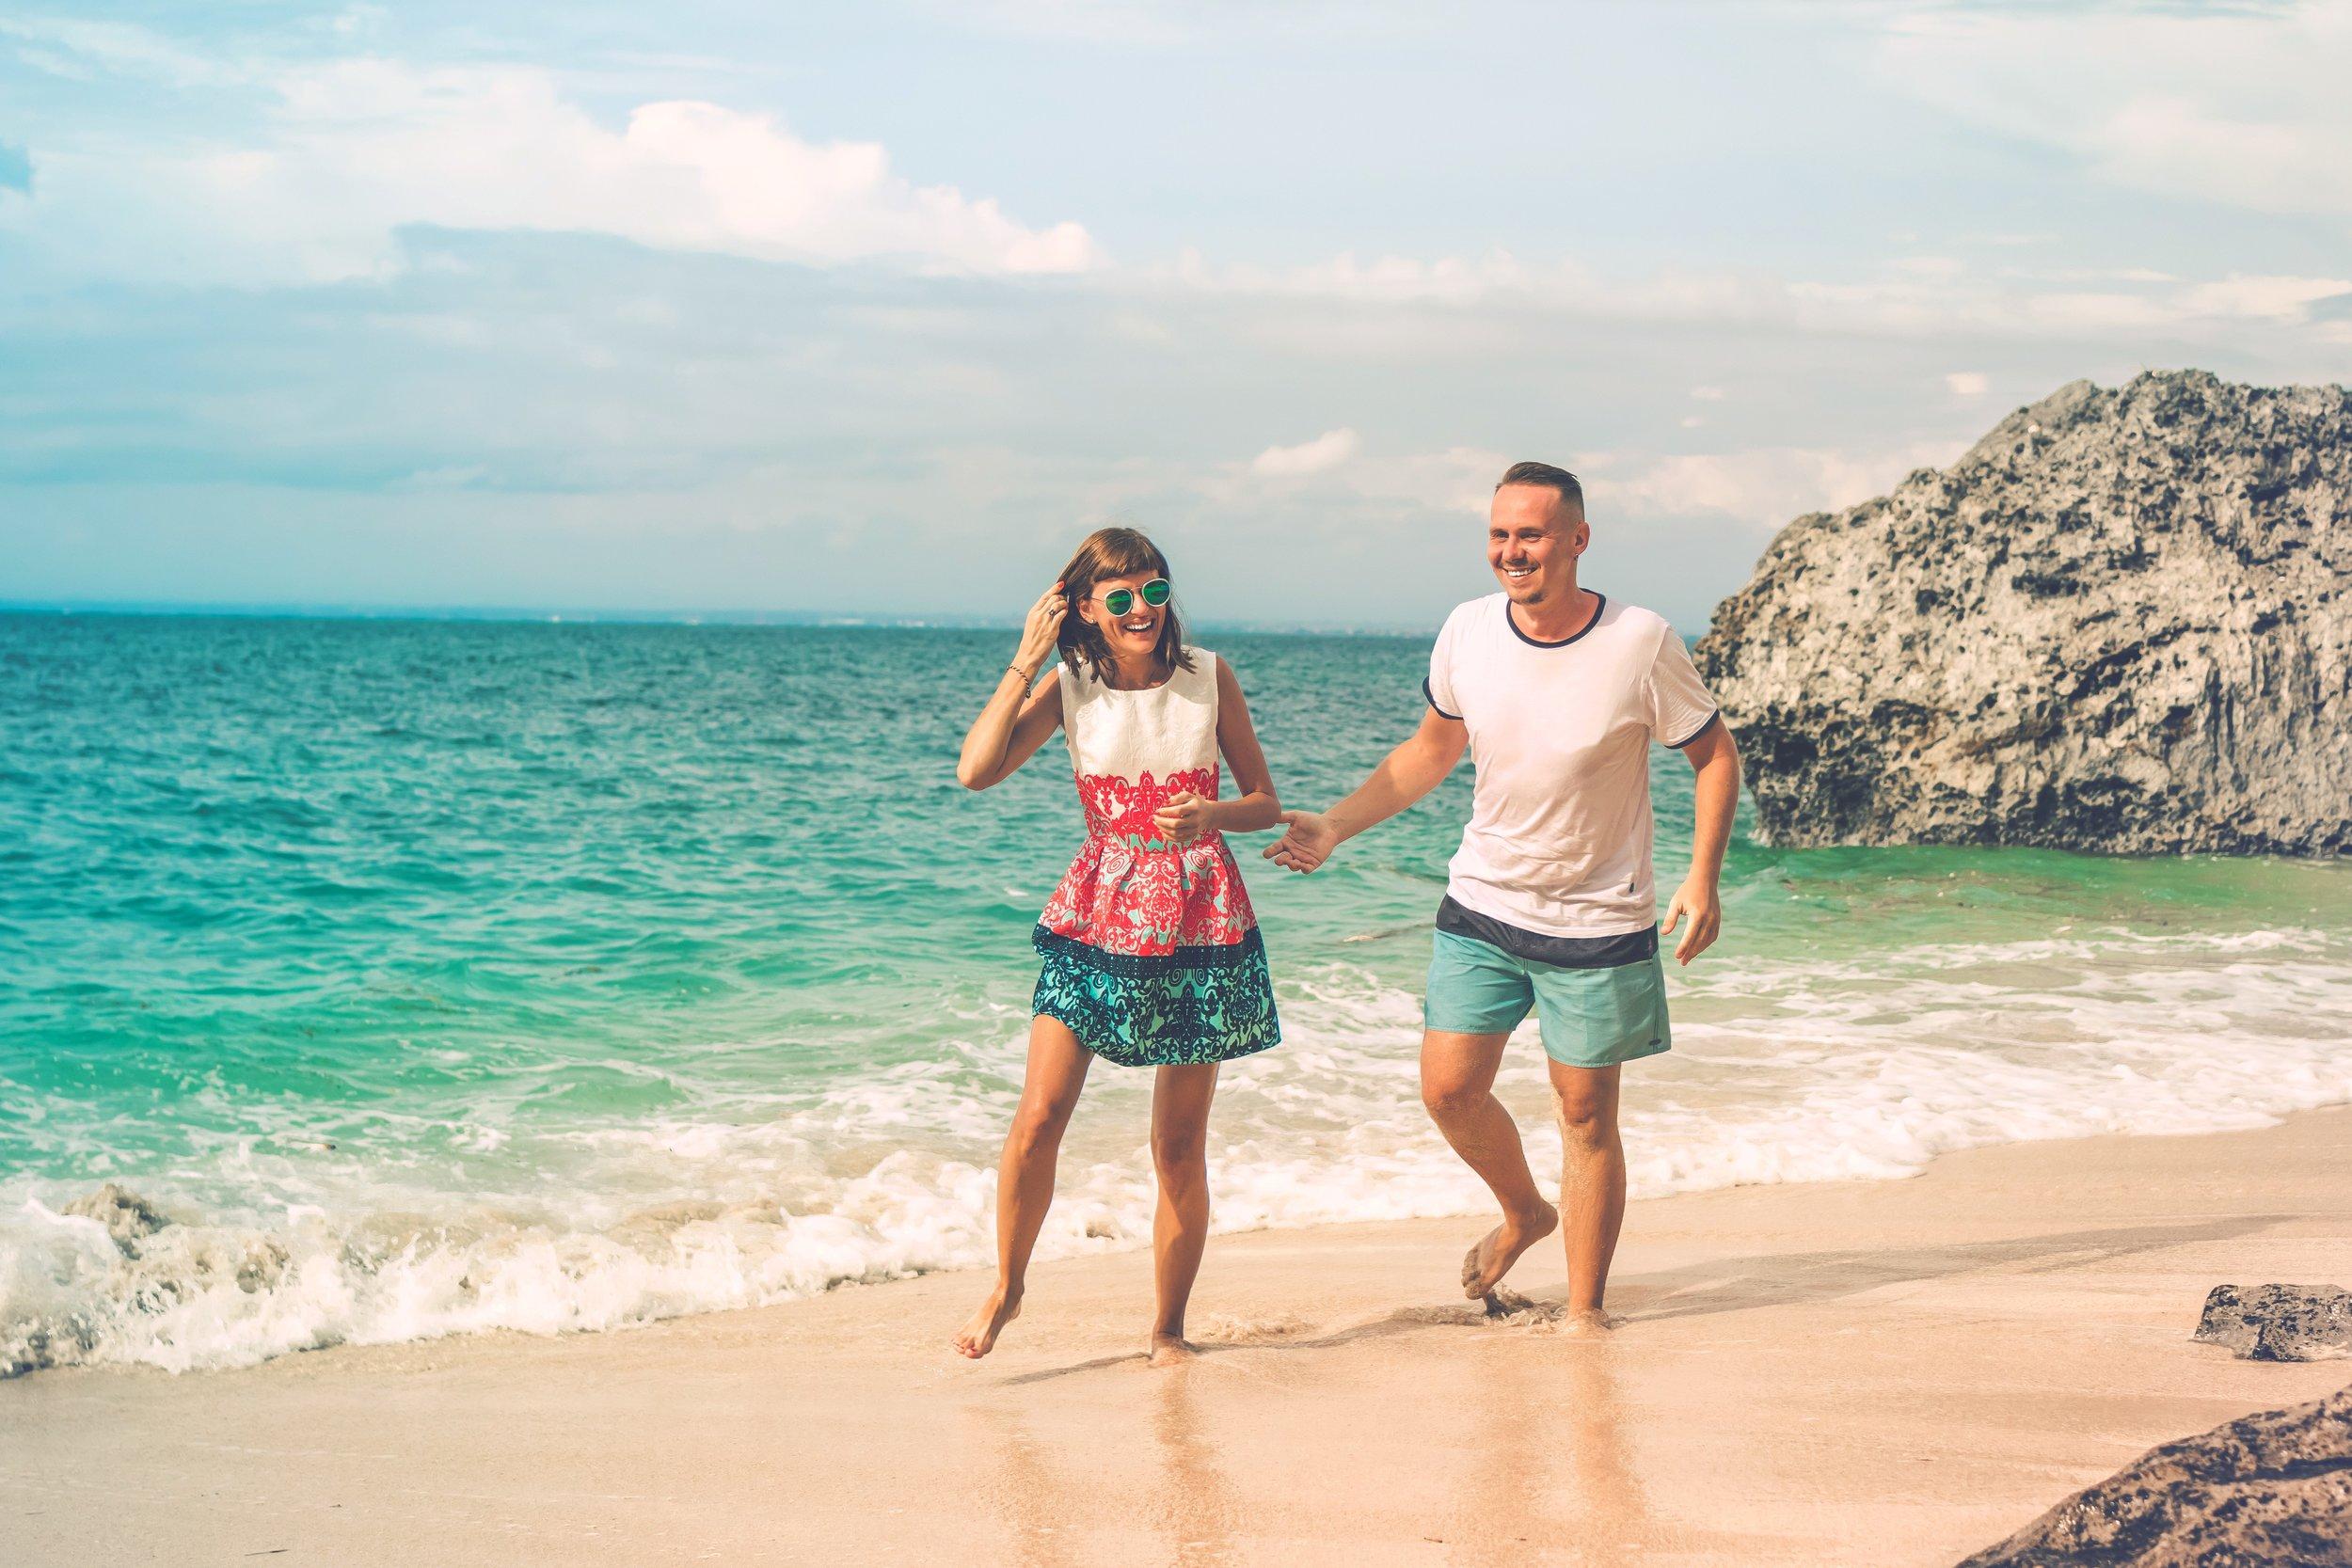 beach-cheerful-couple-2383861 (1).jpg